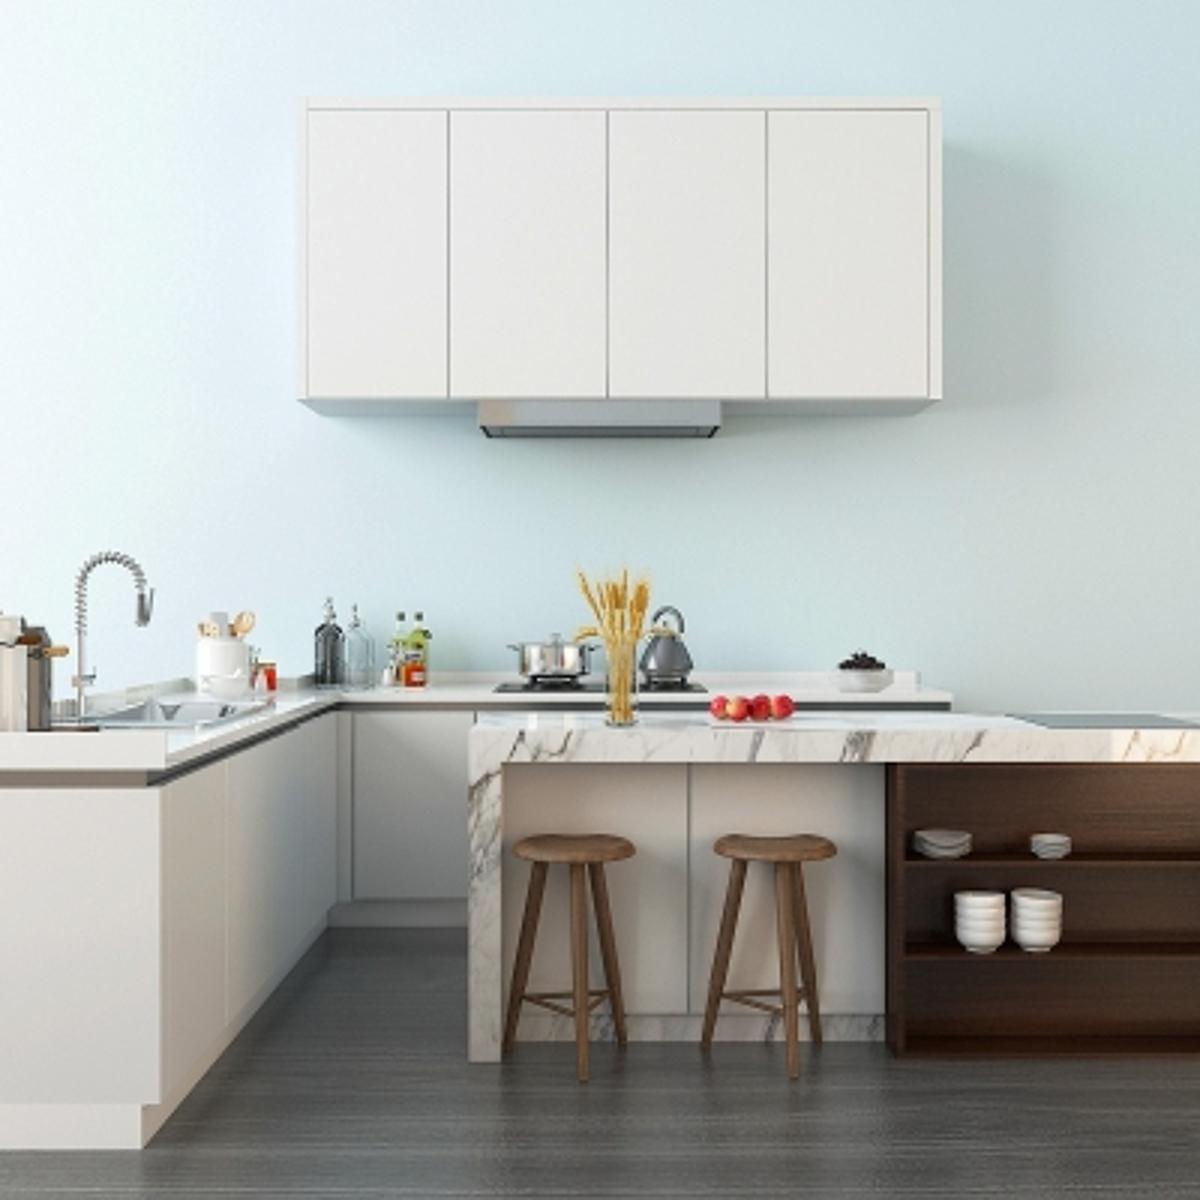 cg245现代简约厨柜模型